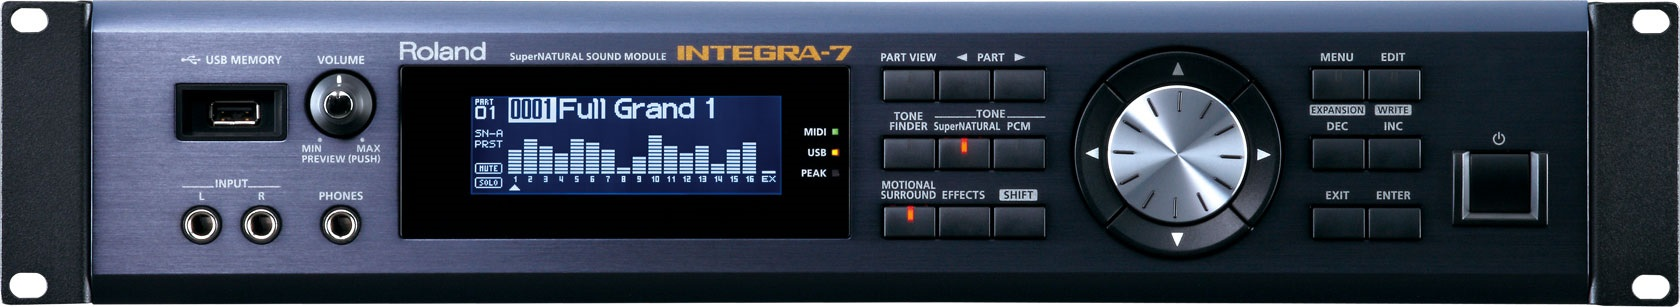 Roland Integra-7